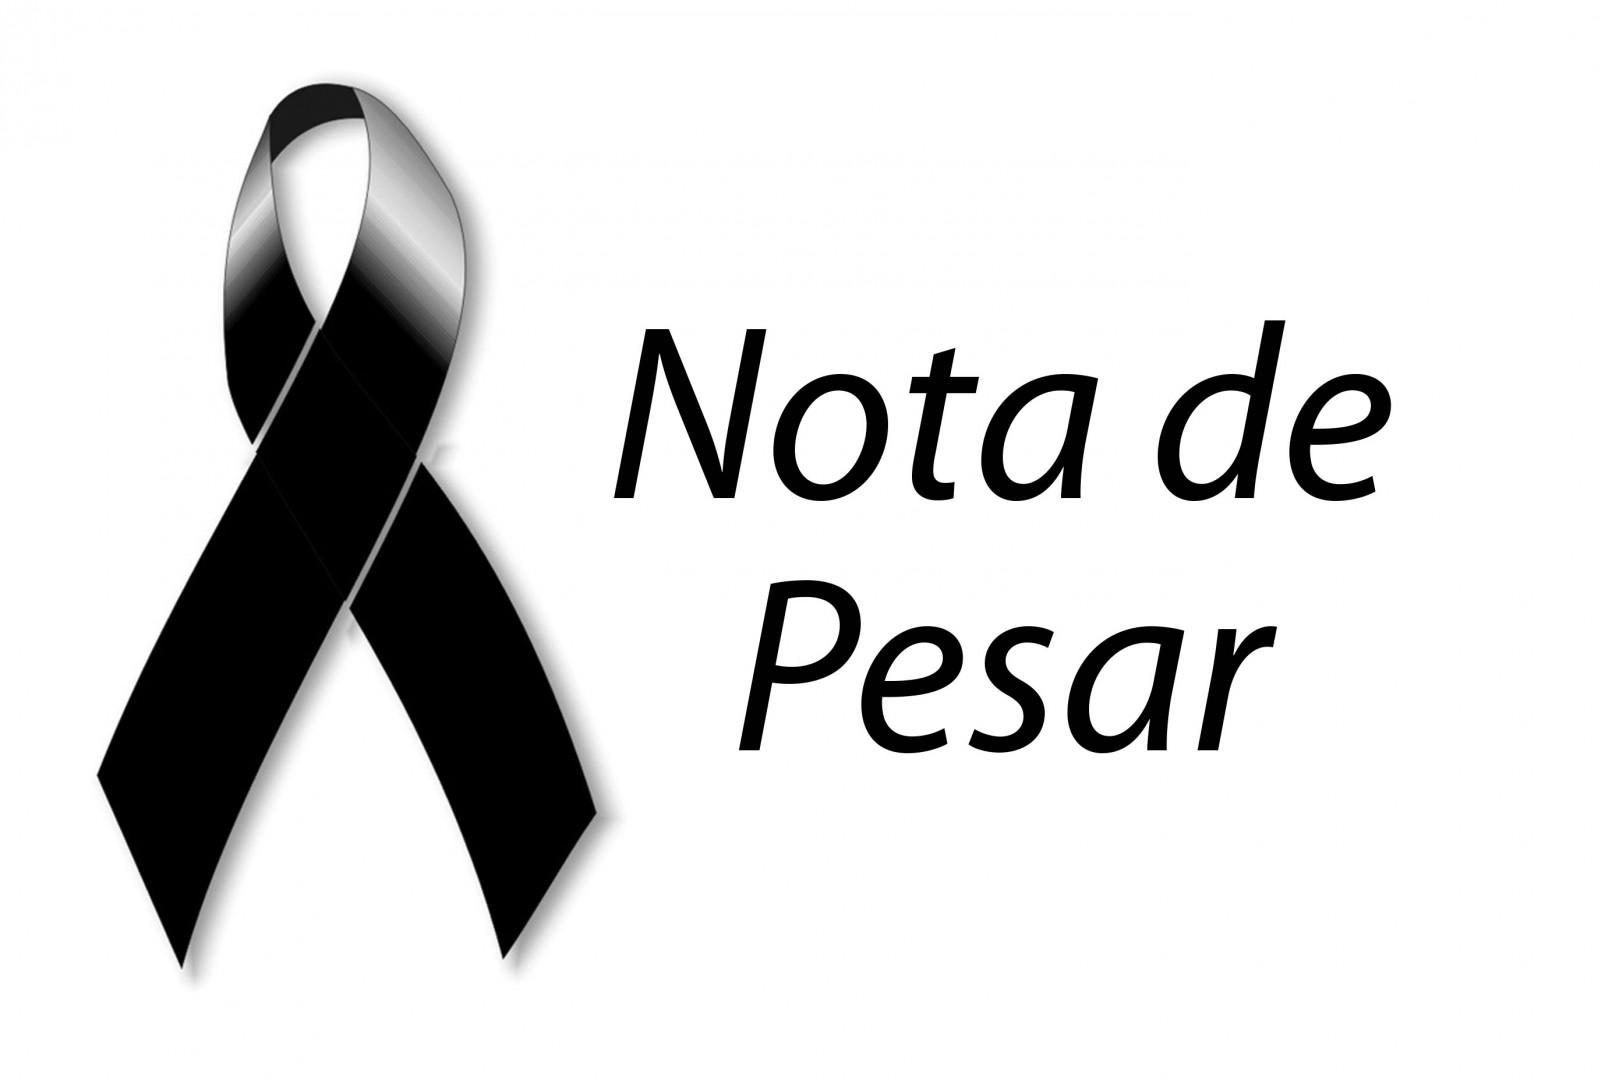 notadepesar1